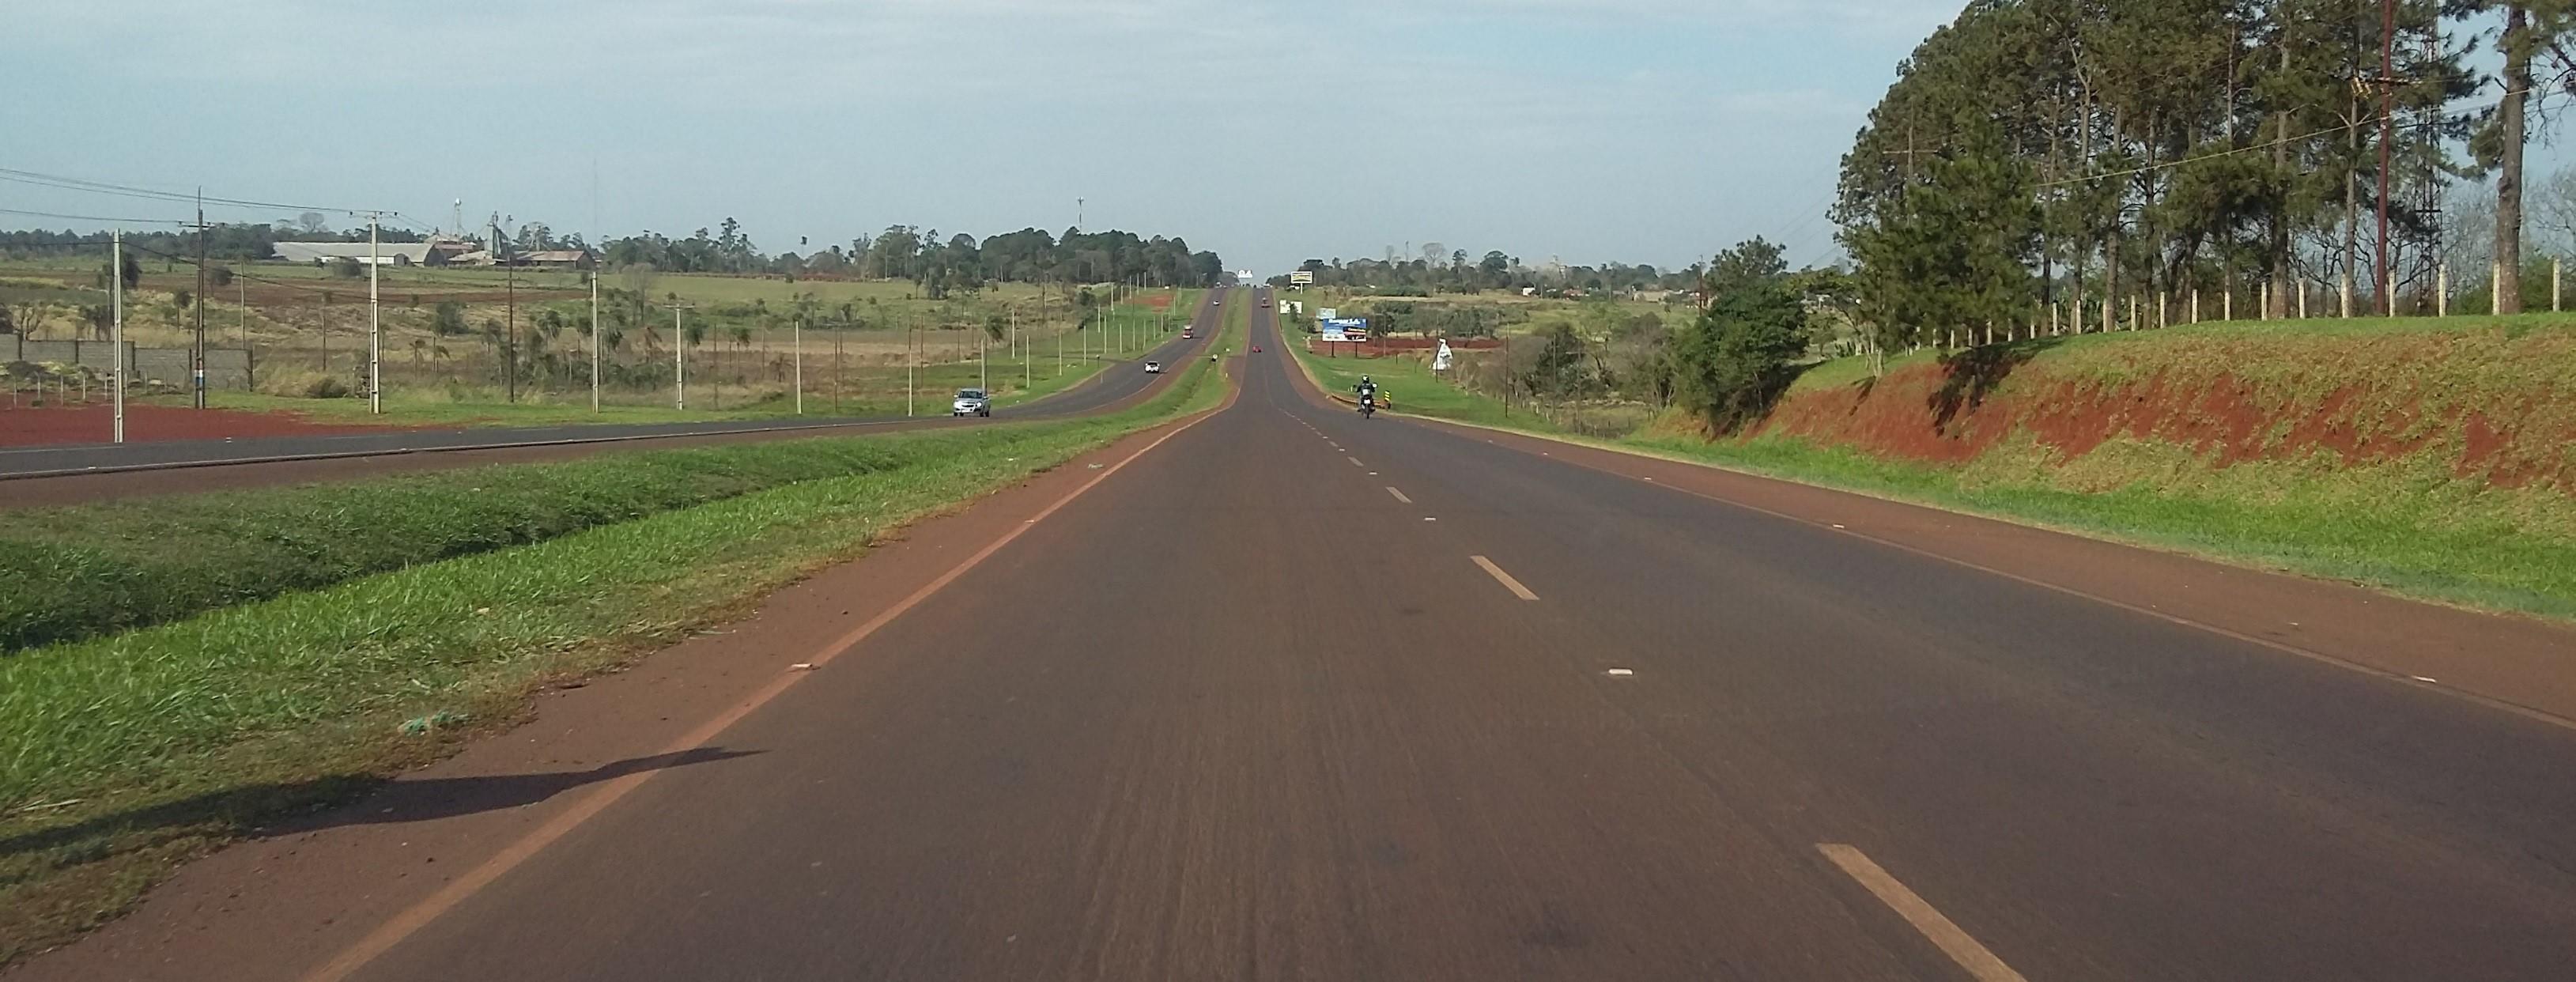 Rutas_del_Este_Paraguay_de_Sacyr